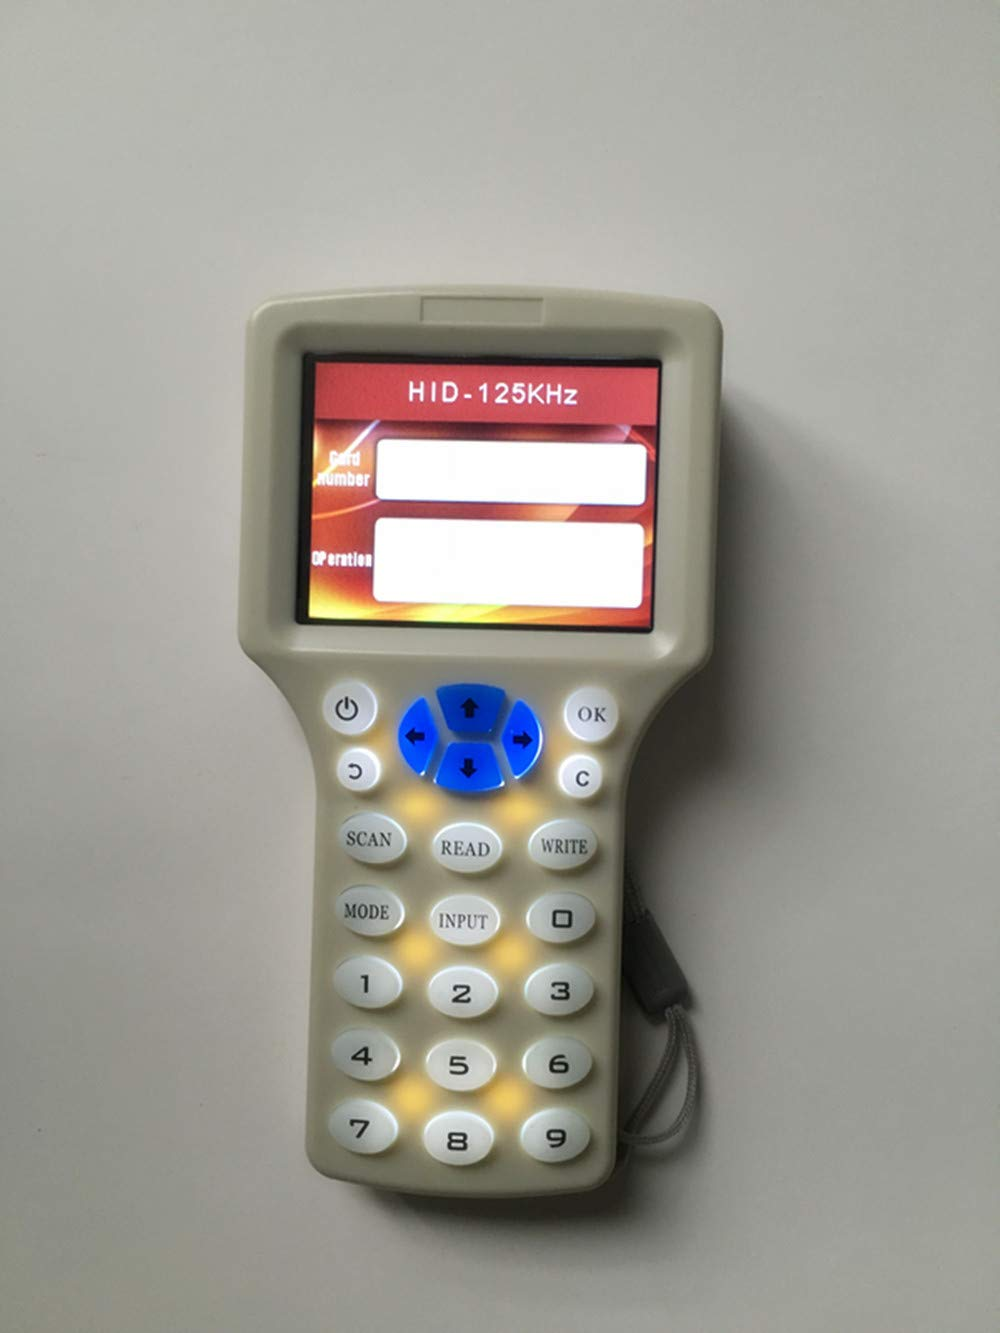 1 USB 10pcs ID 125kh Keyfobs English 10 Frequency NFC RFID Card Copier Reader Writer Duplicator for IC ID Cards and All 125kHz Cards,10pcs ID 125khz Cards 10pcs 13.56mhz UID Key